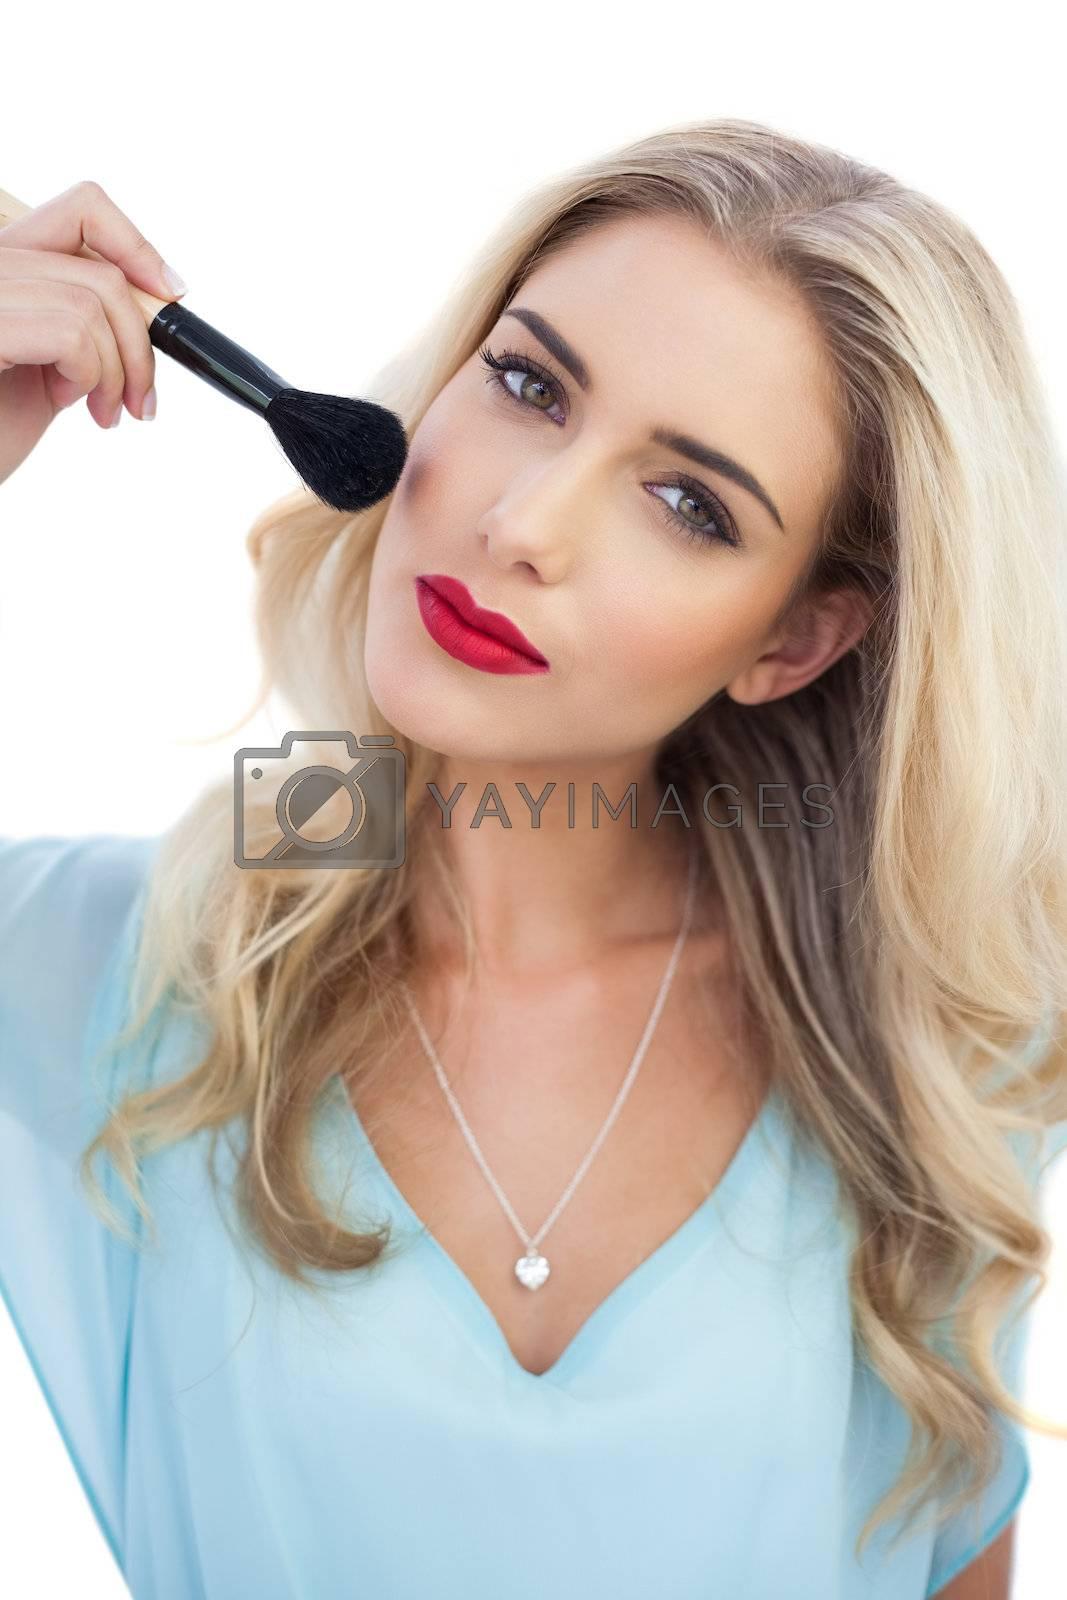 Thoughtful blonde model in blue dress applying make up by Wavebreakmedia